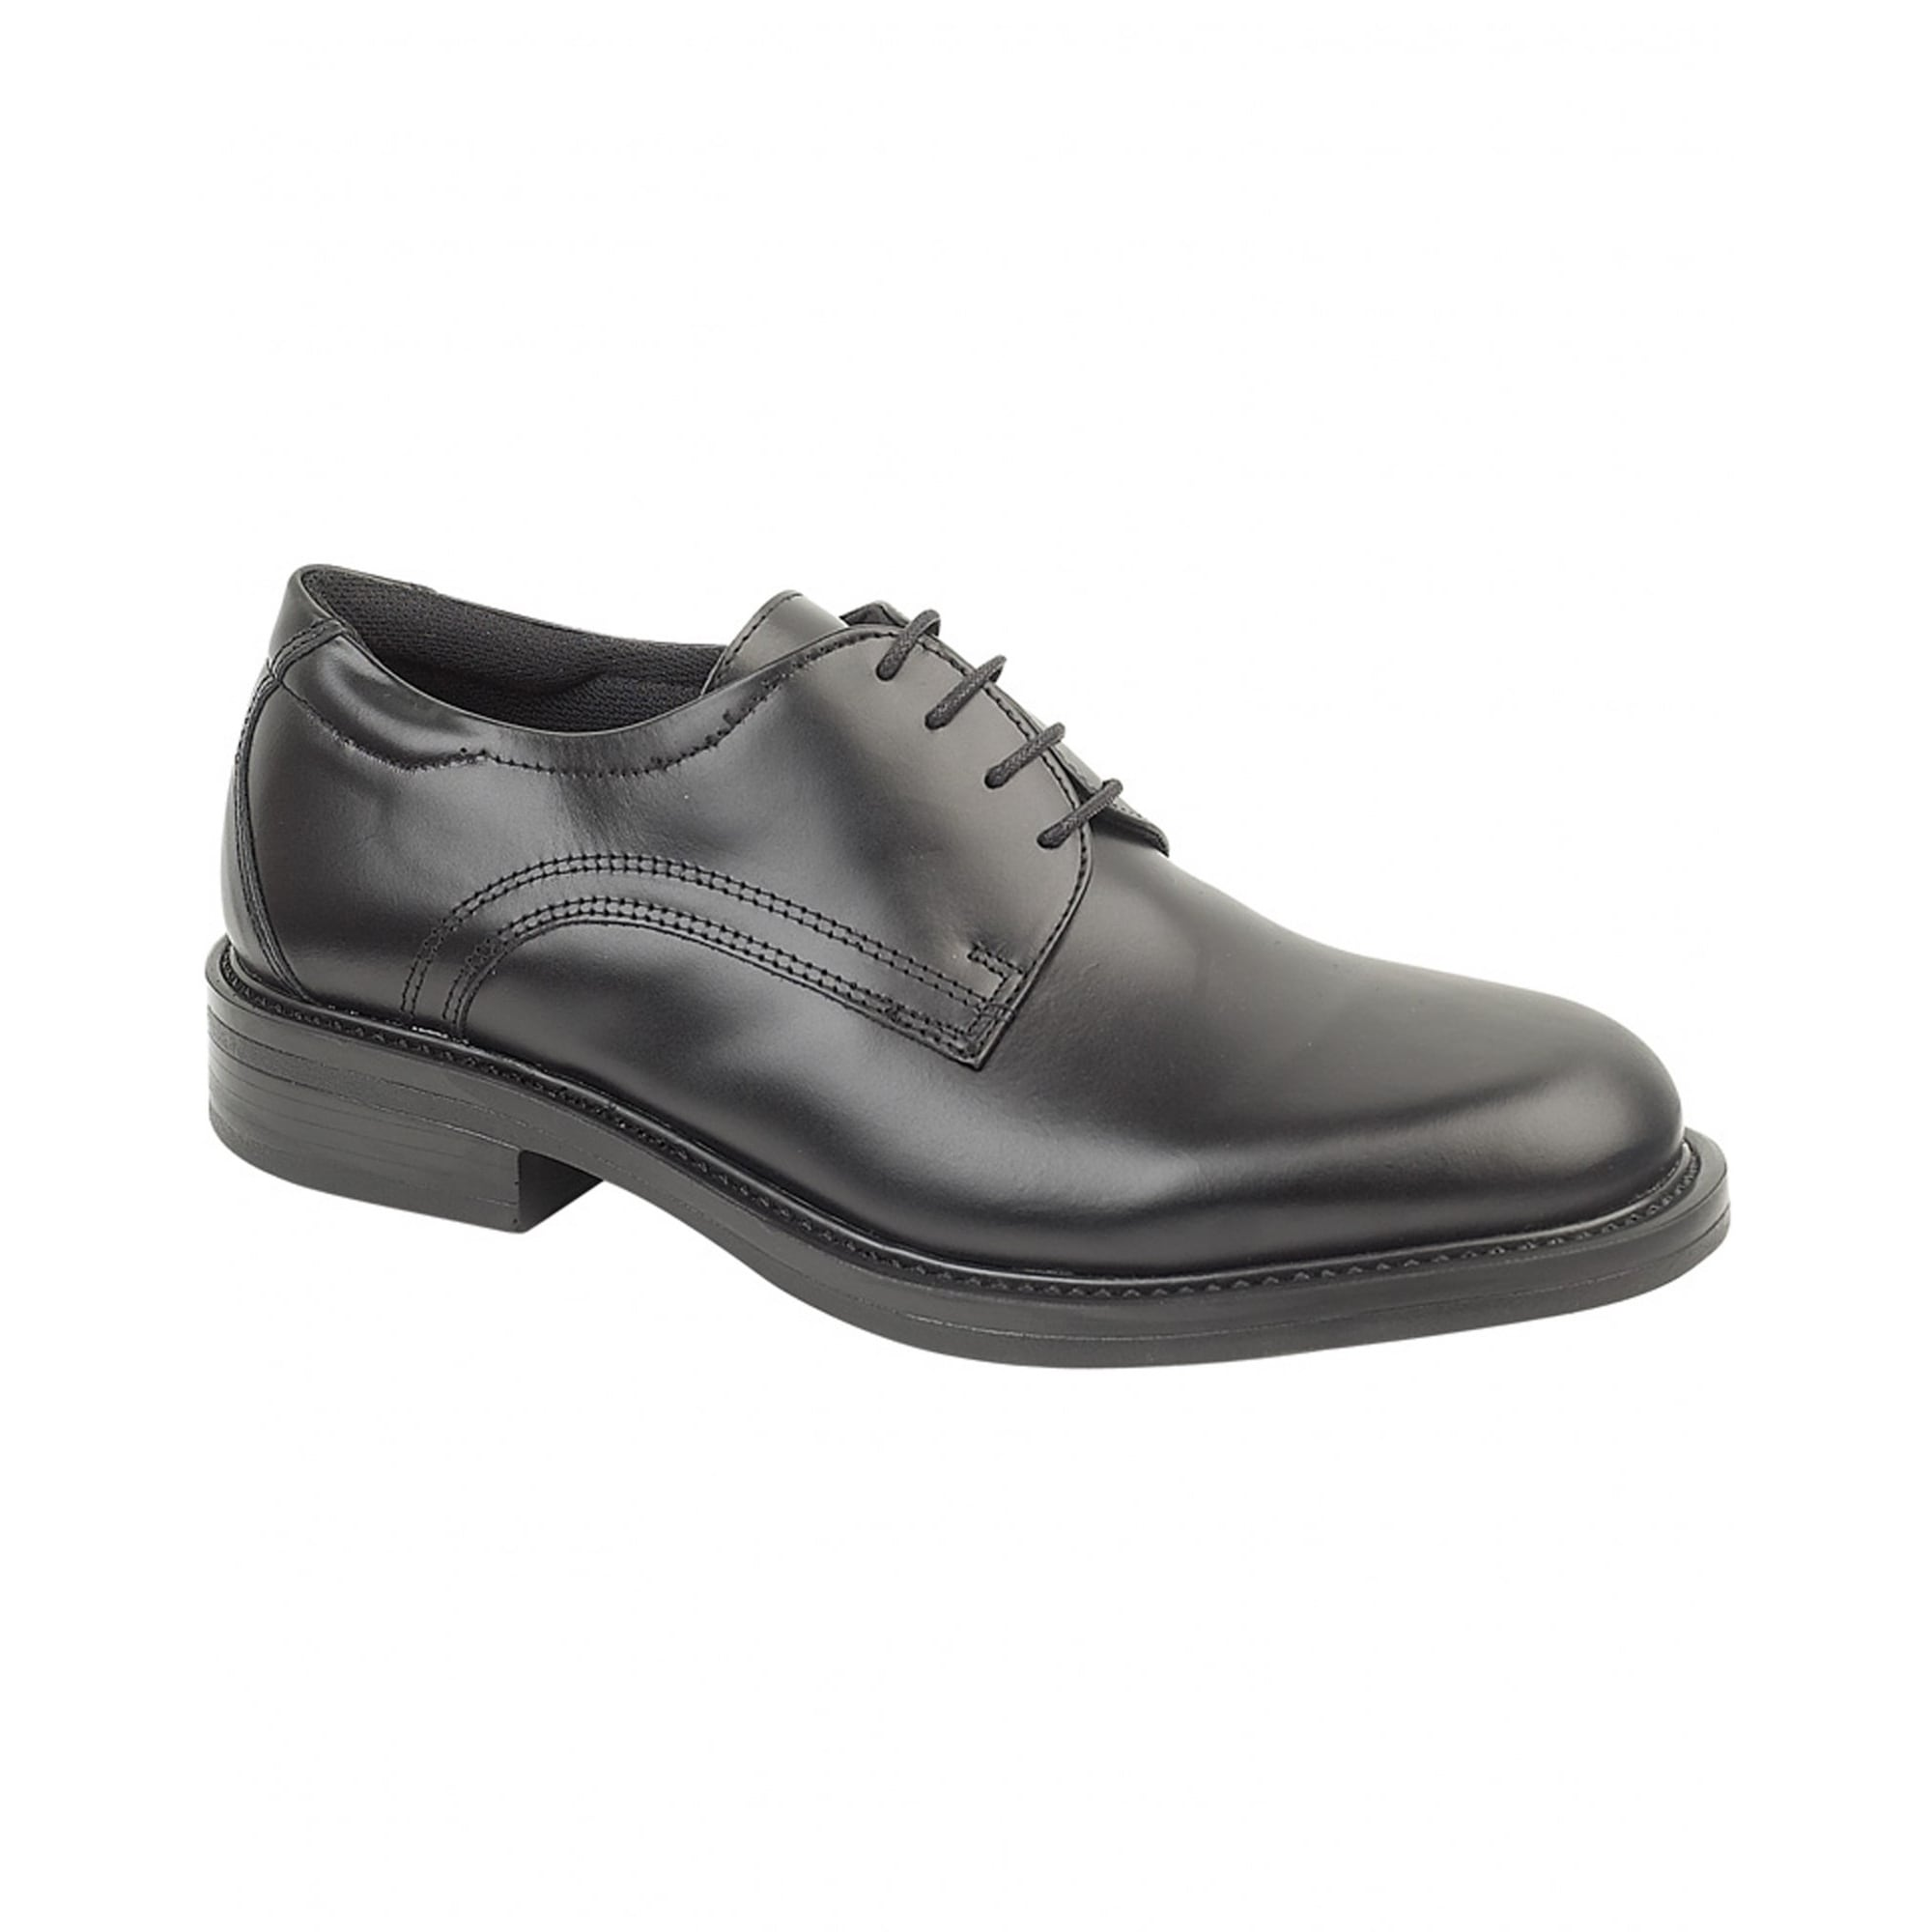 Magnum Arbeitsschuh Active Duty CT (54318) Sicherheitsschuhe Herrenmode/Schuhe/Arbeitsschuhe